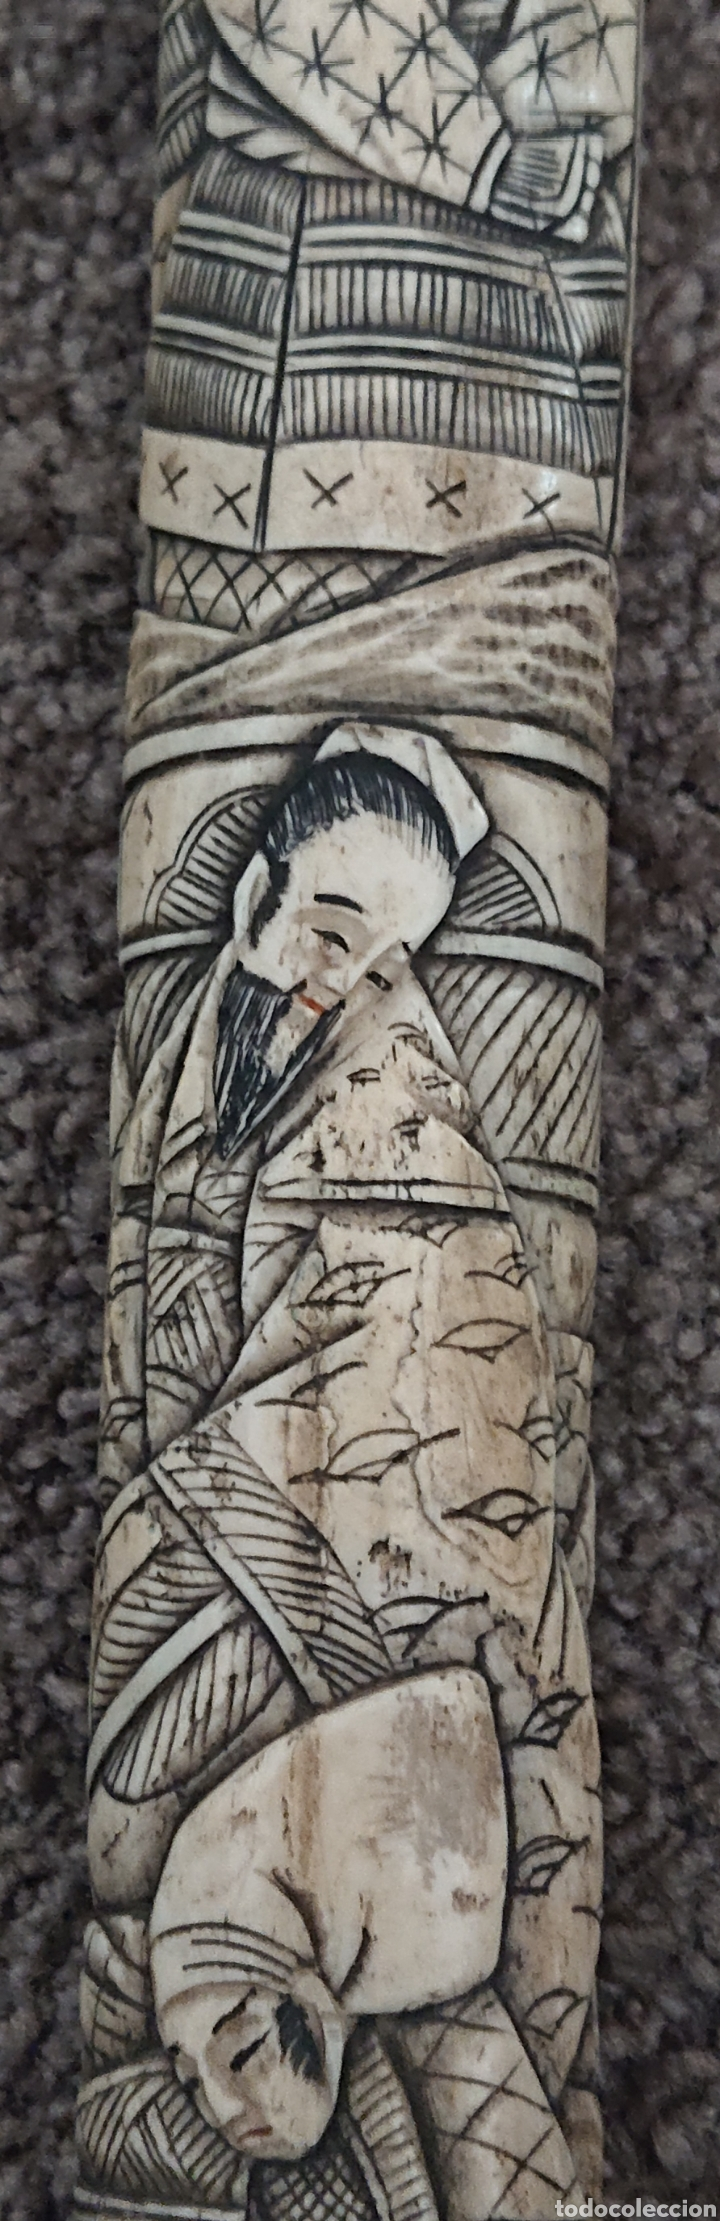 Arte: Funda sable o espada japonés, Japón, hueso o similar, gran pieza, ved fotos - Foto 3 - 276801593